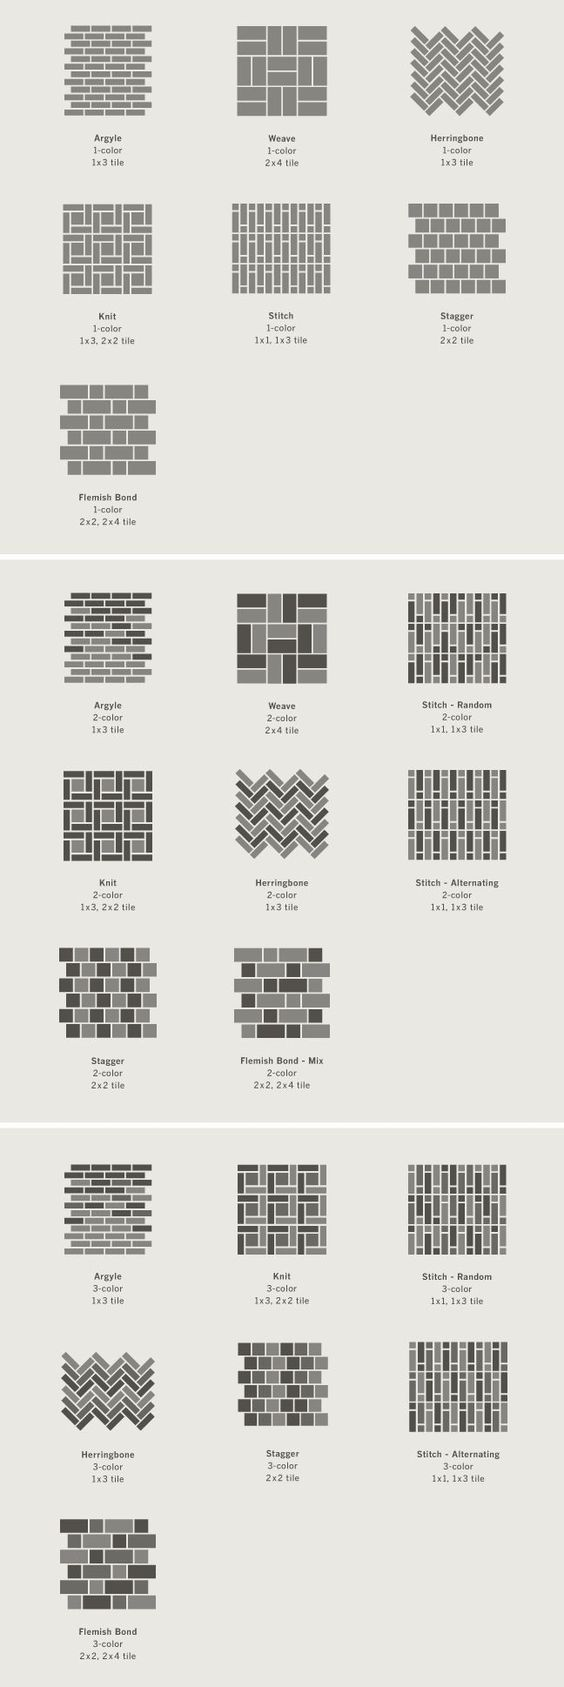 Great ideas for backsplash or bathroom floor design. Tapestry Collection - Heath Ceramics layout concepts: